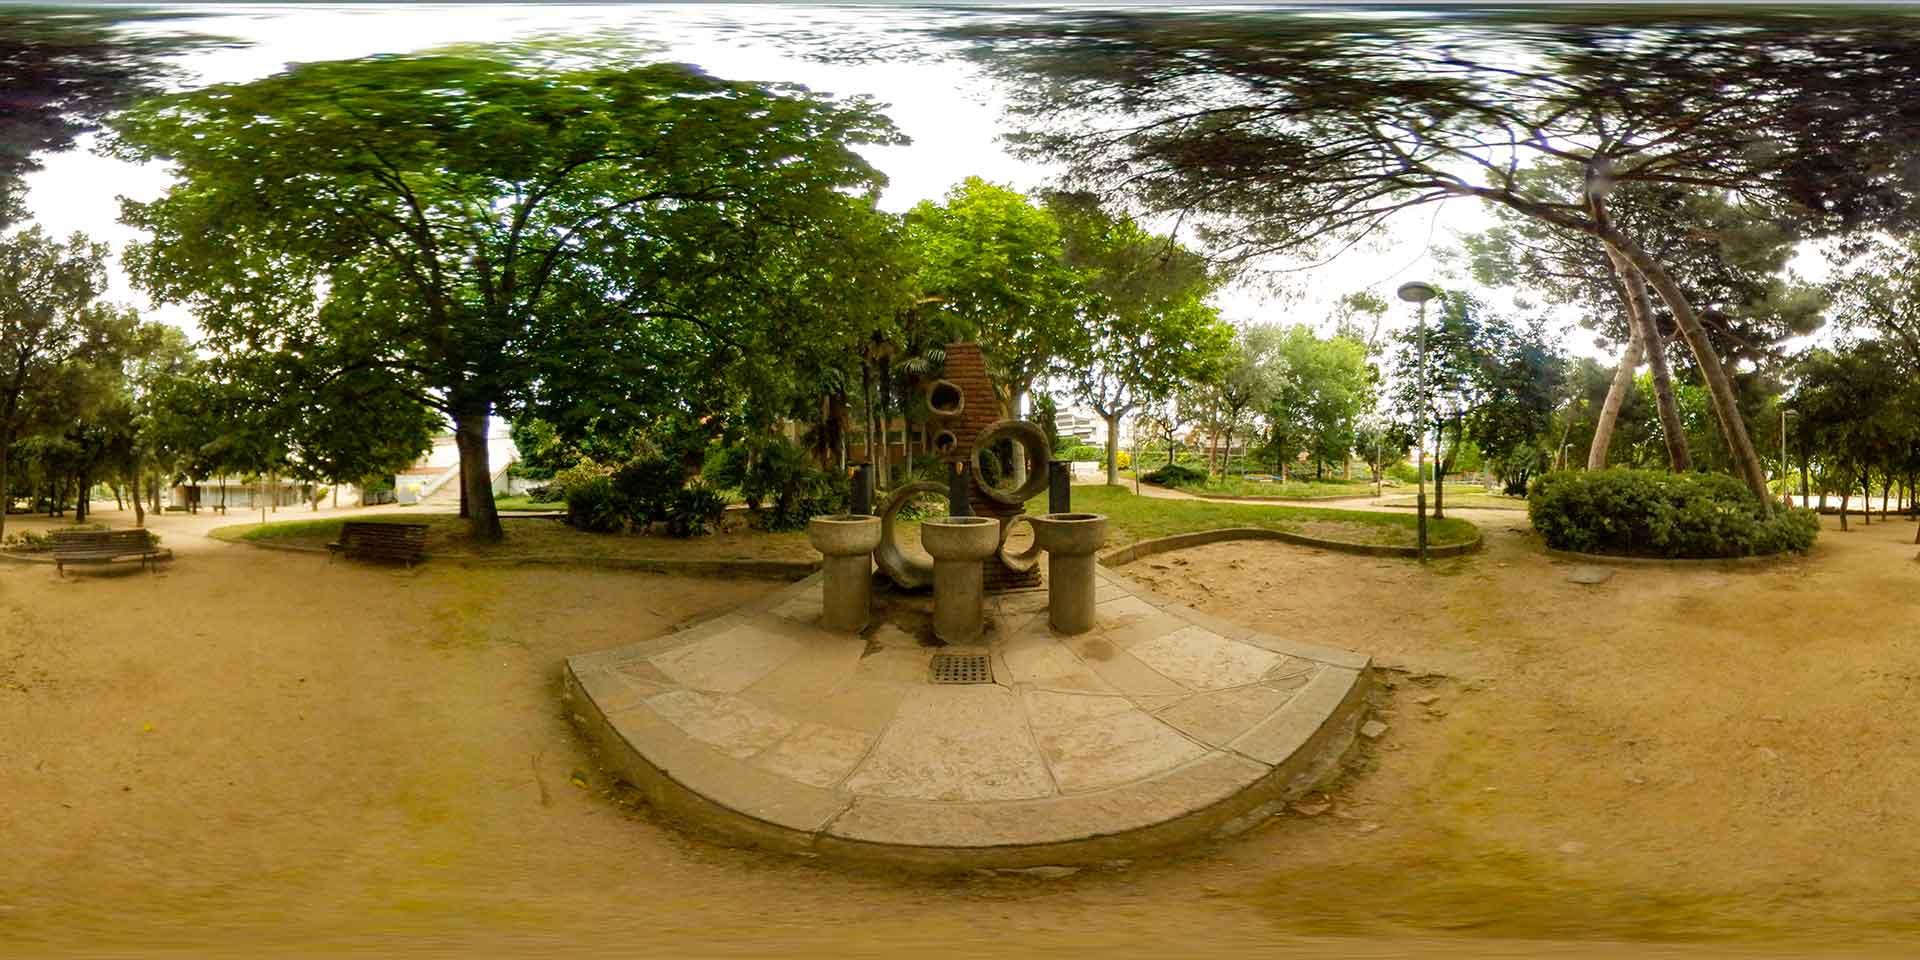 ▷ Parque Central de Mataró en 360 GRADOS - Fotos 360º GRATIS